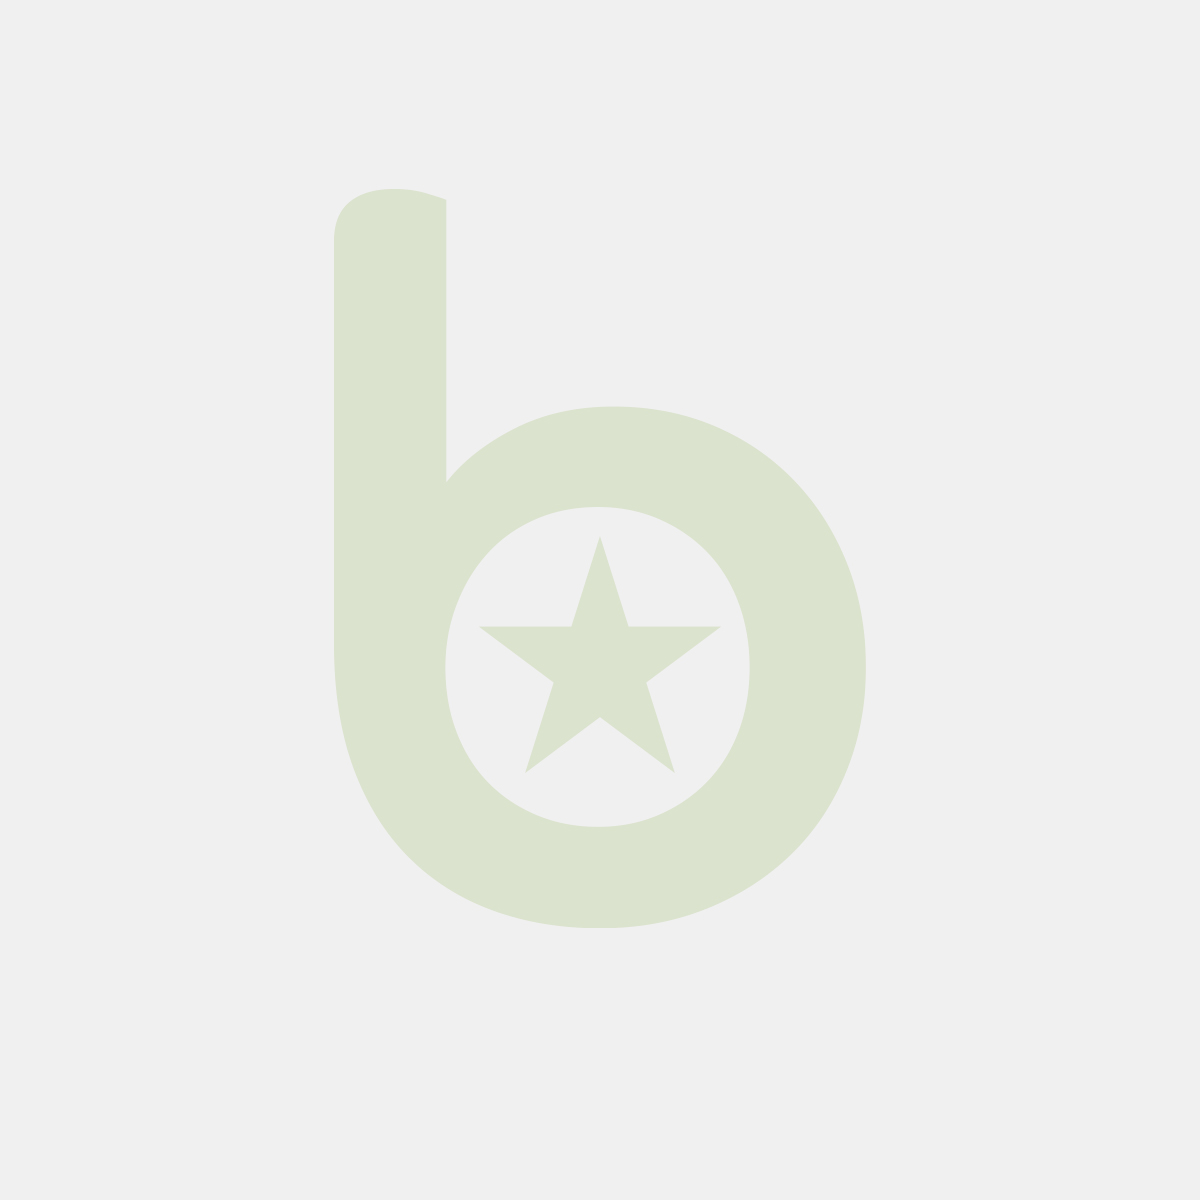 Patelnia żeliwna GN 1/1 - kod 932001